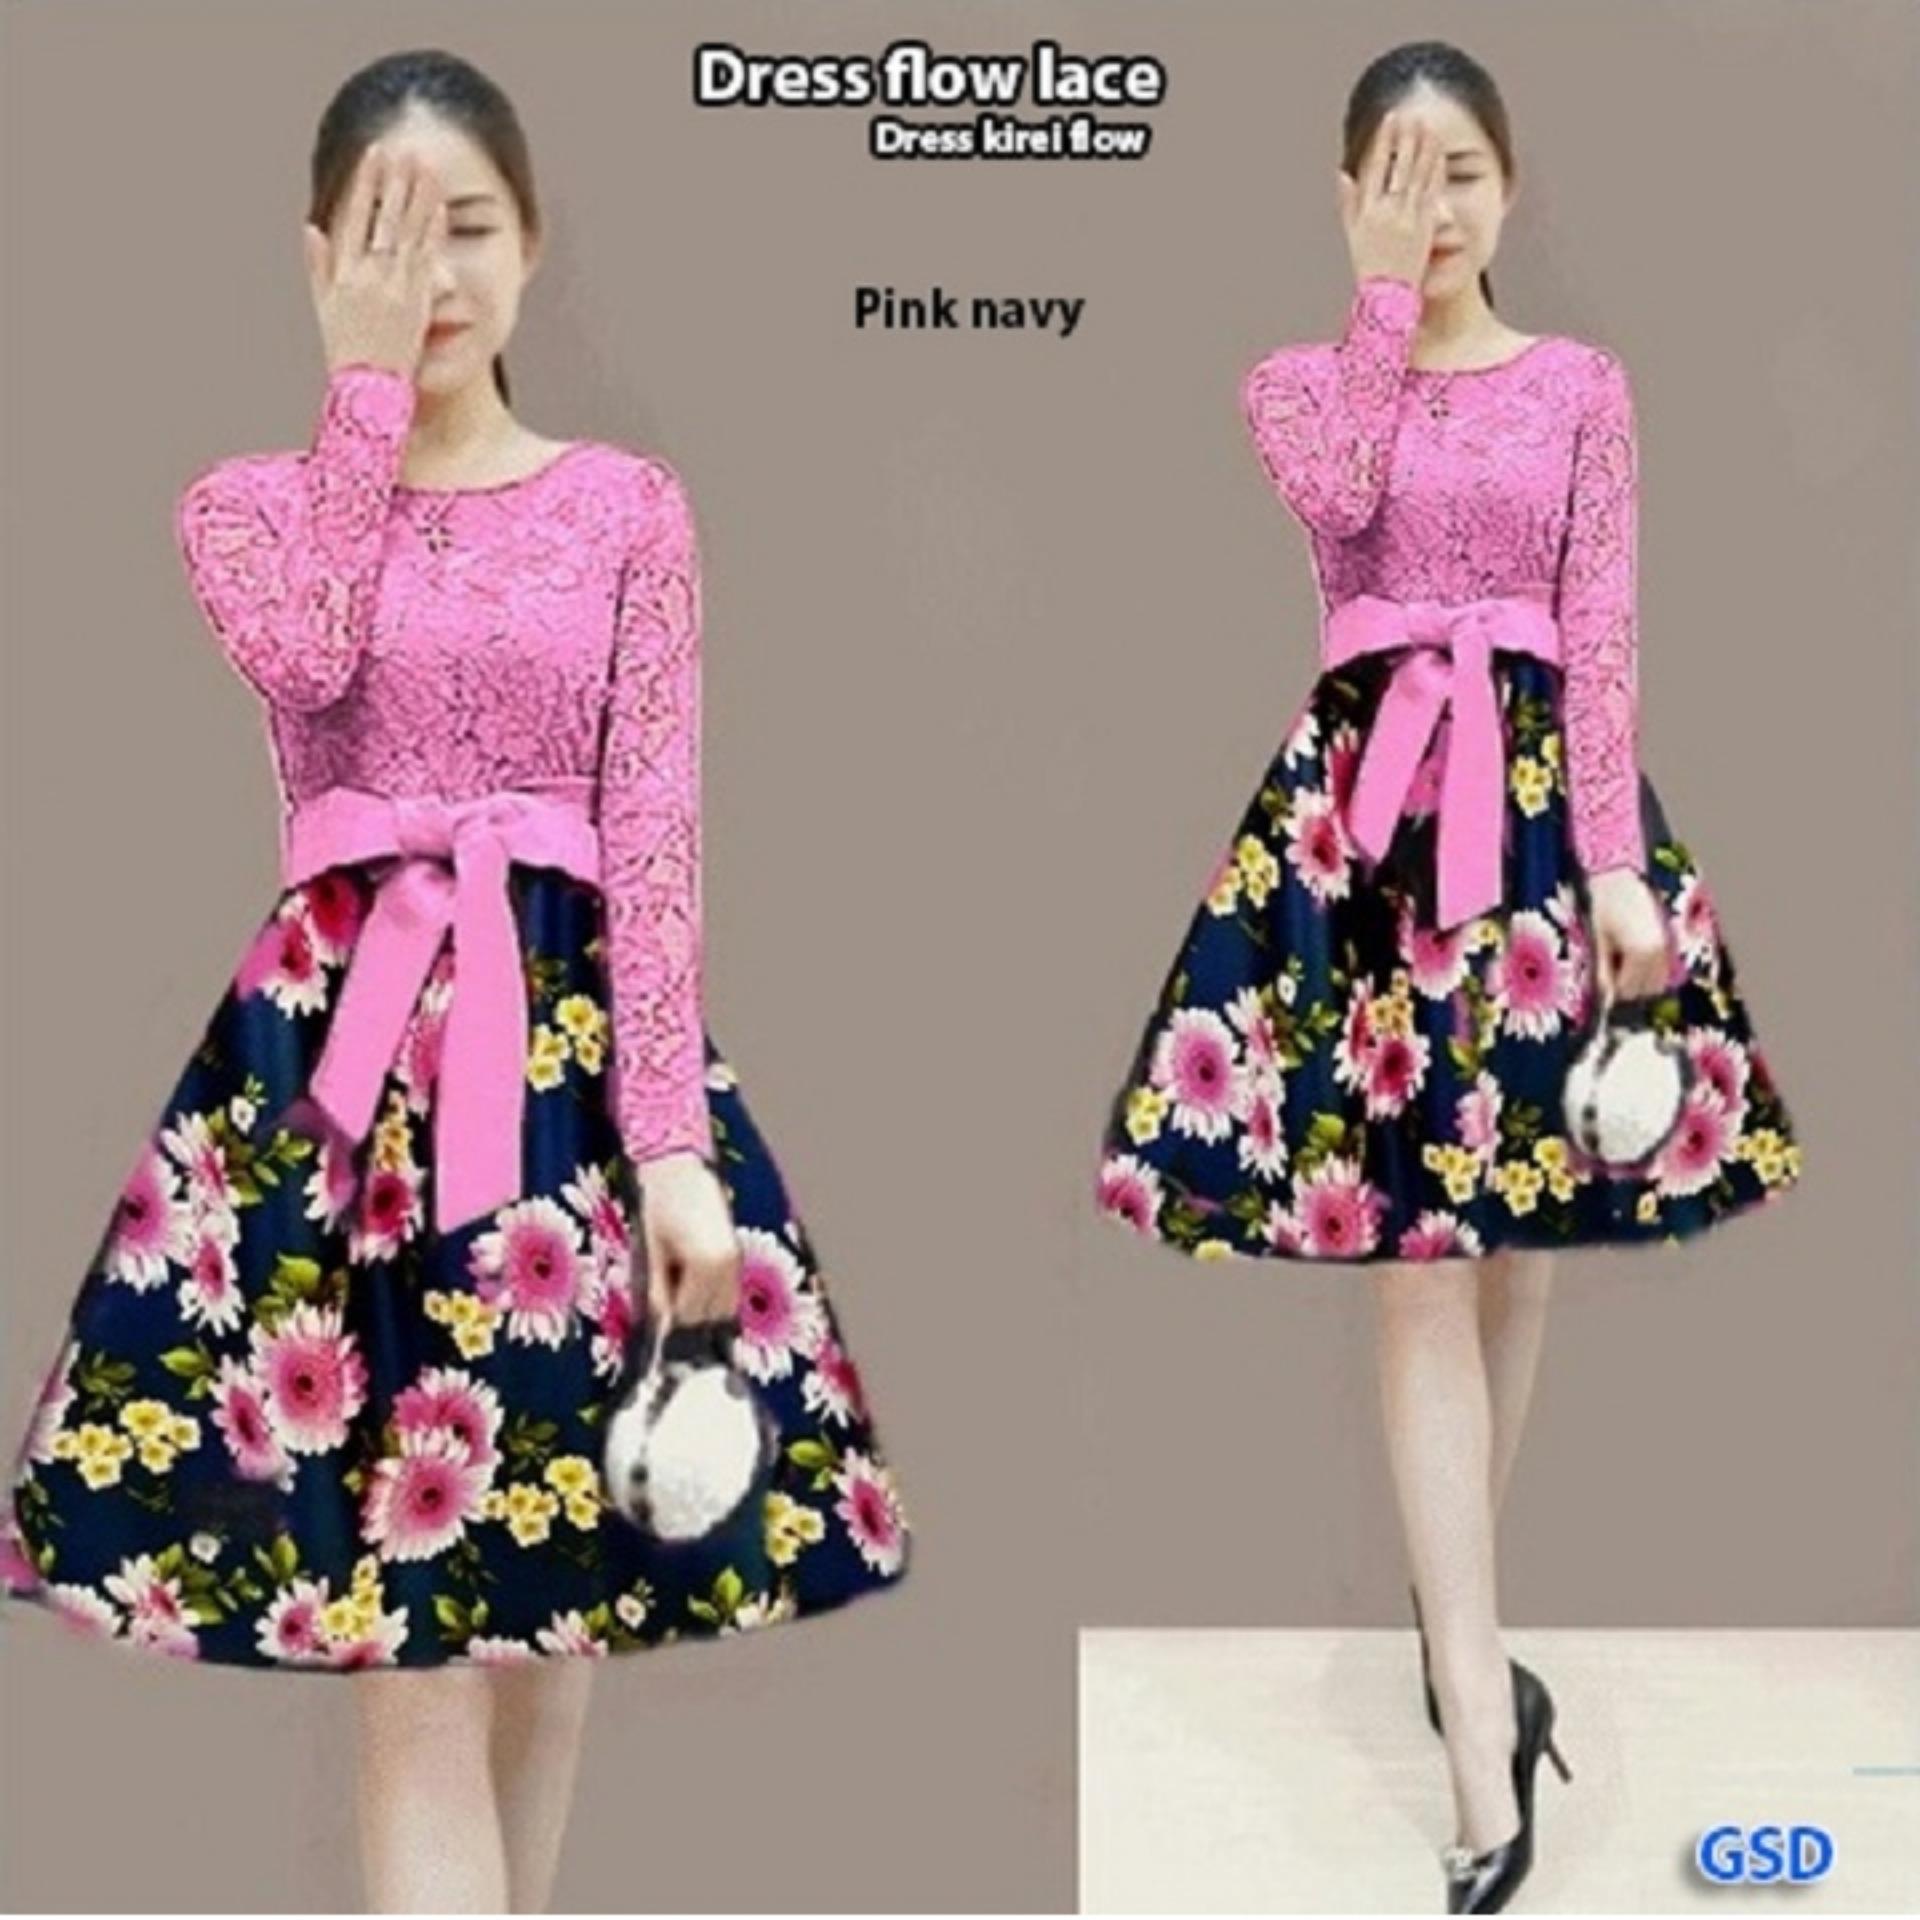 Baju wanita / dress / dress flow lace / dress kirei